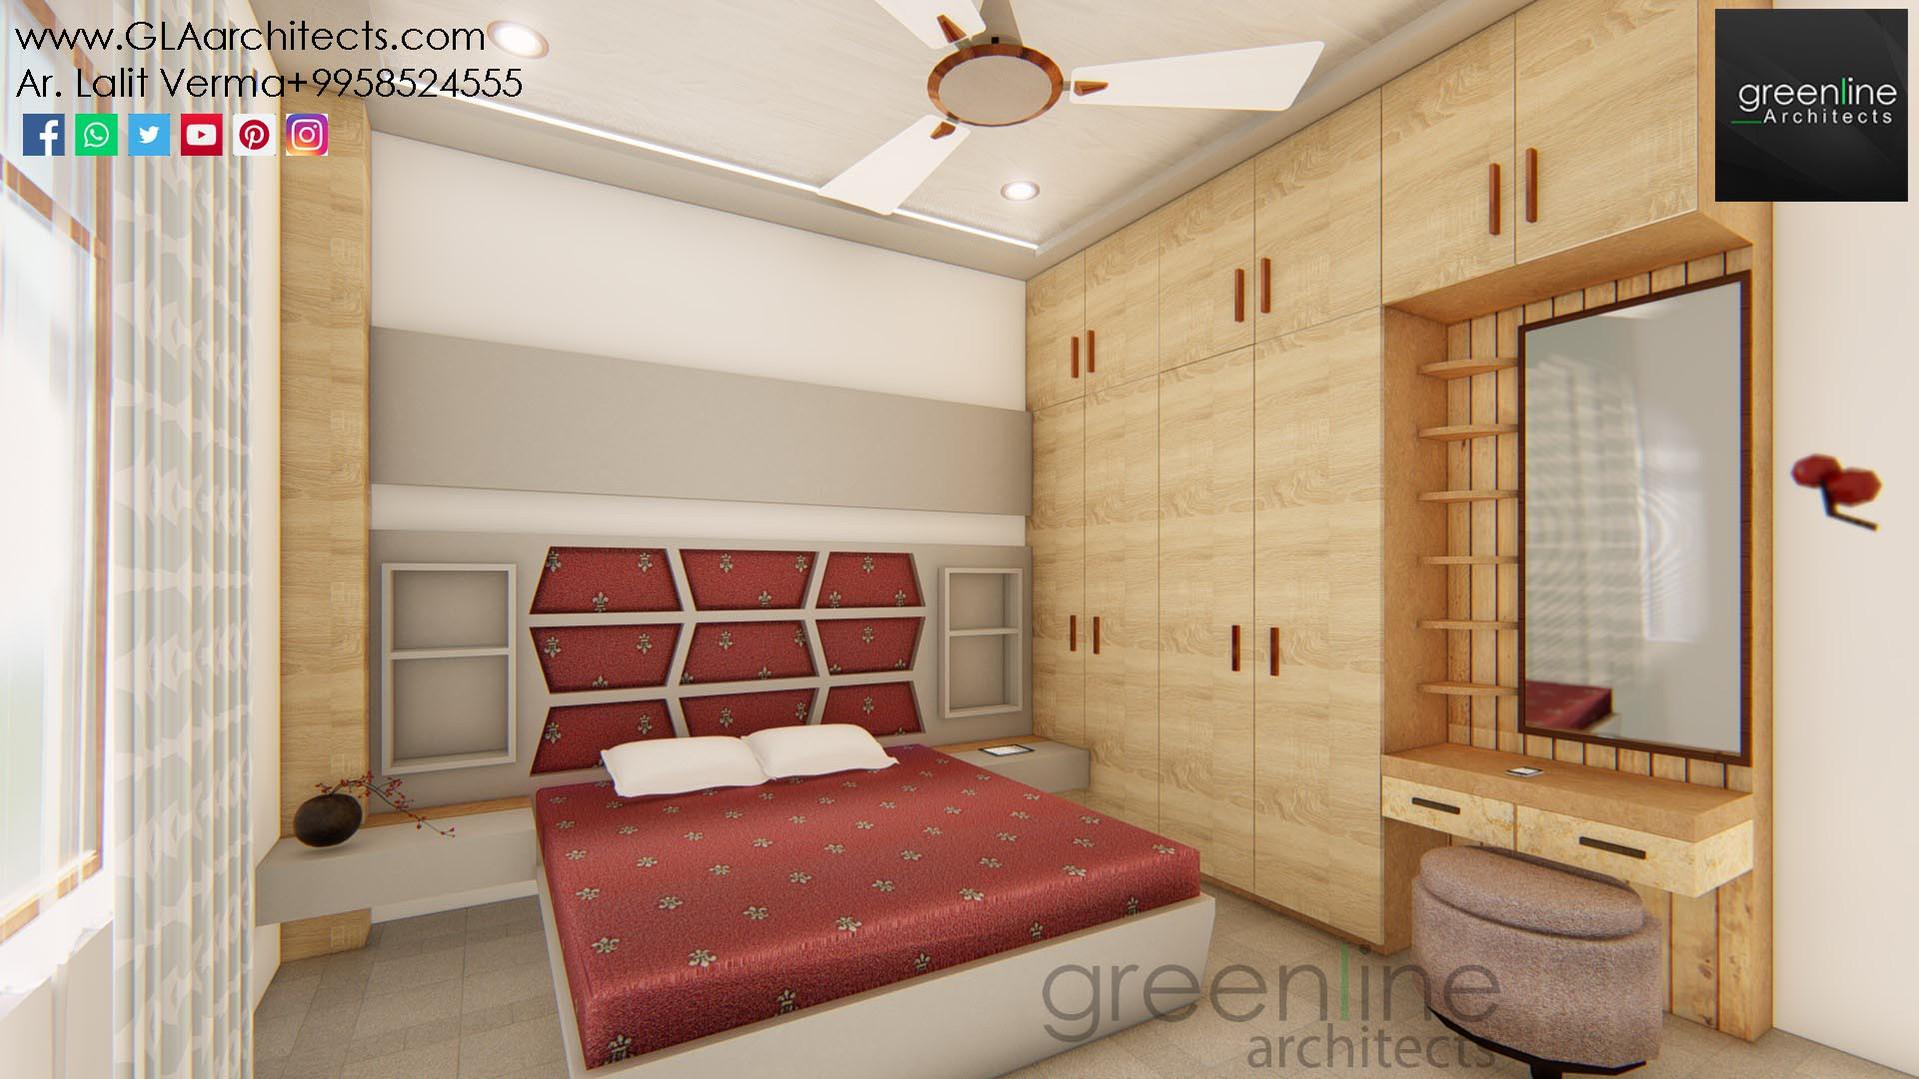 3 BHK-Apartment_Home Interior (8).jpg